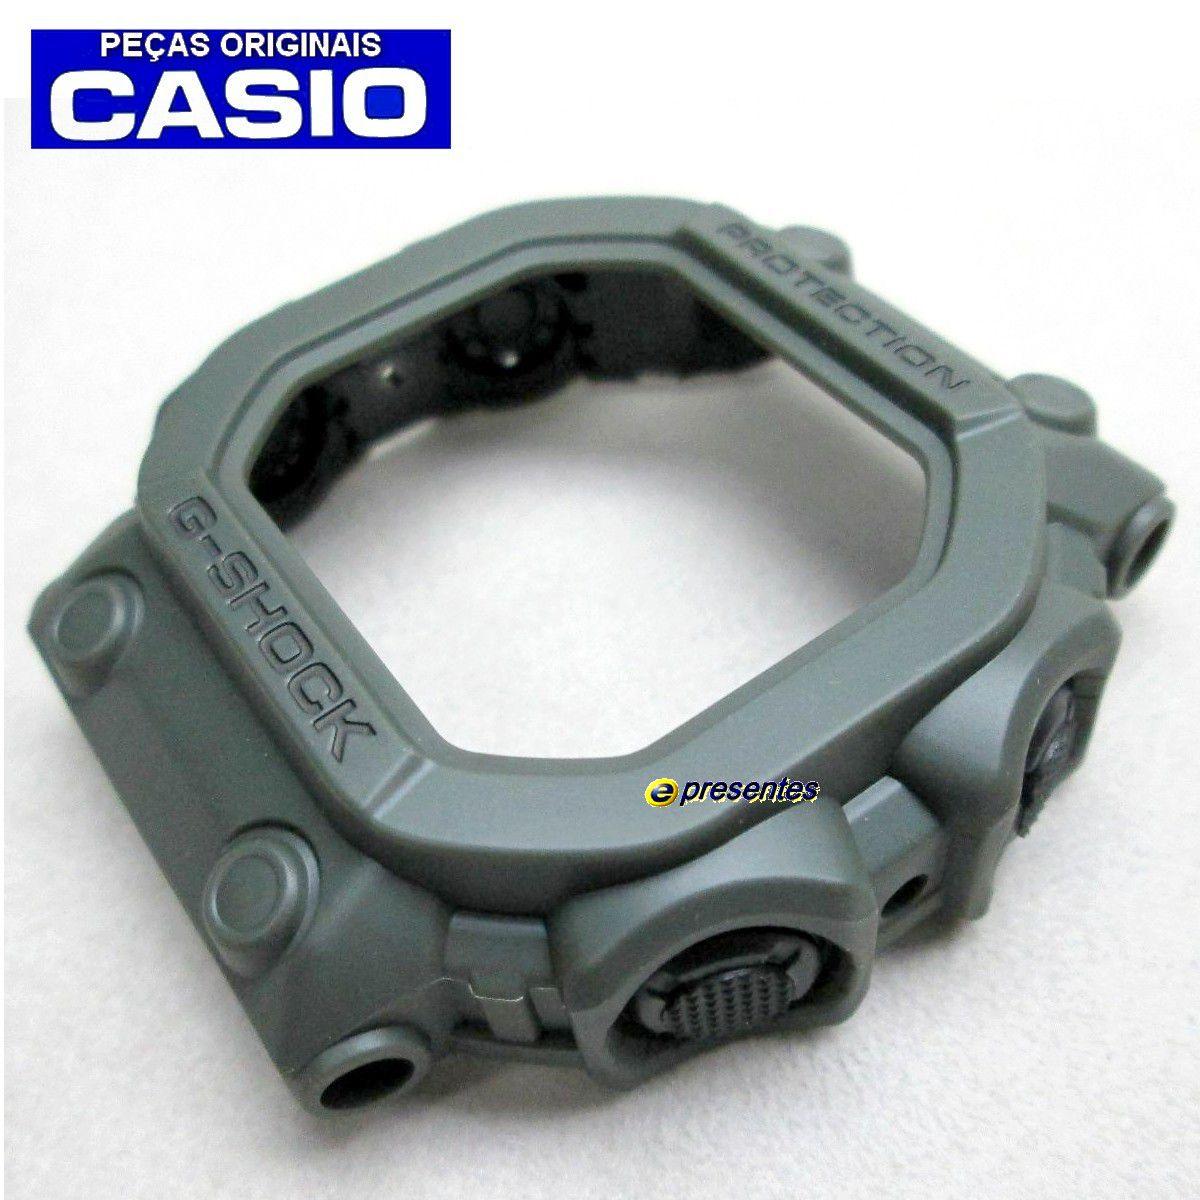 Bezel Casio GX-56KG-3 / GWX-56KG-3 G-shock Verde Militar Fosco *  - E-Presentes